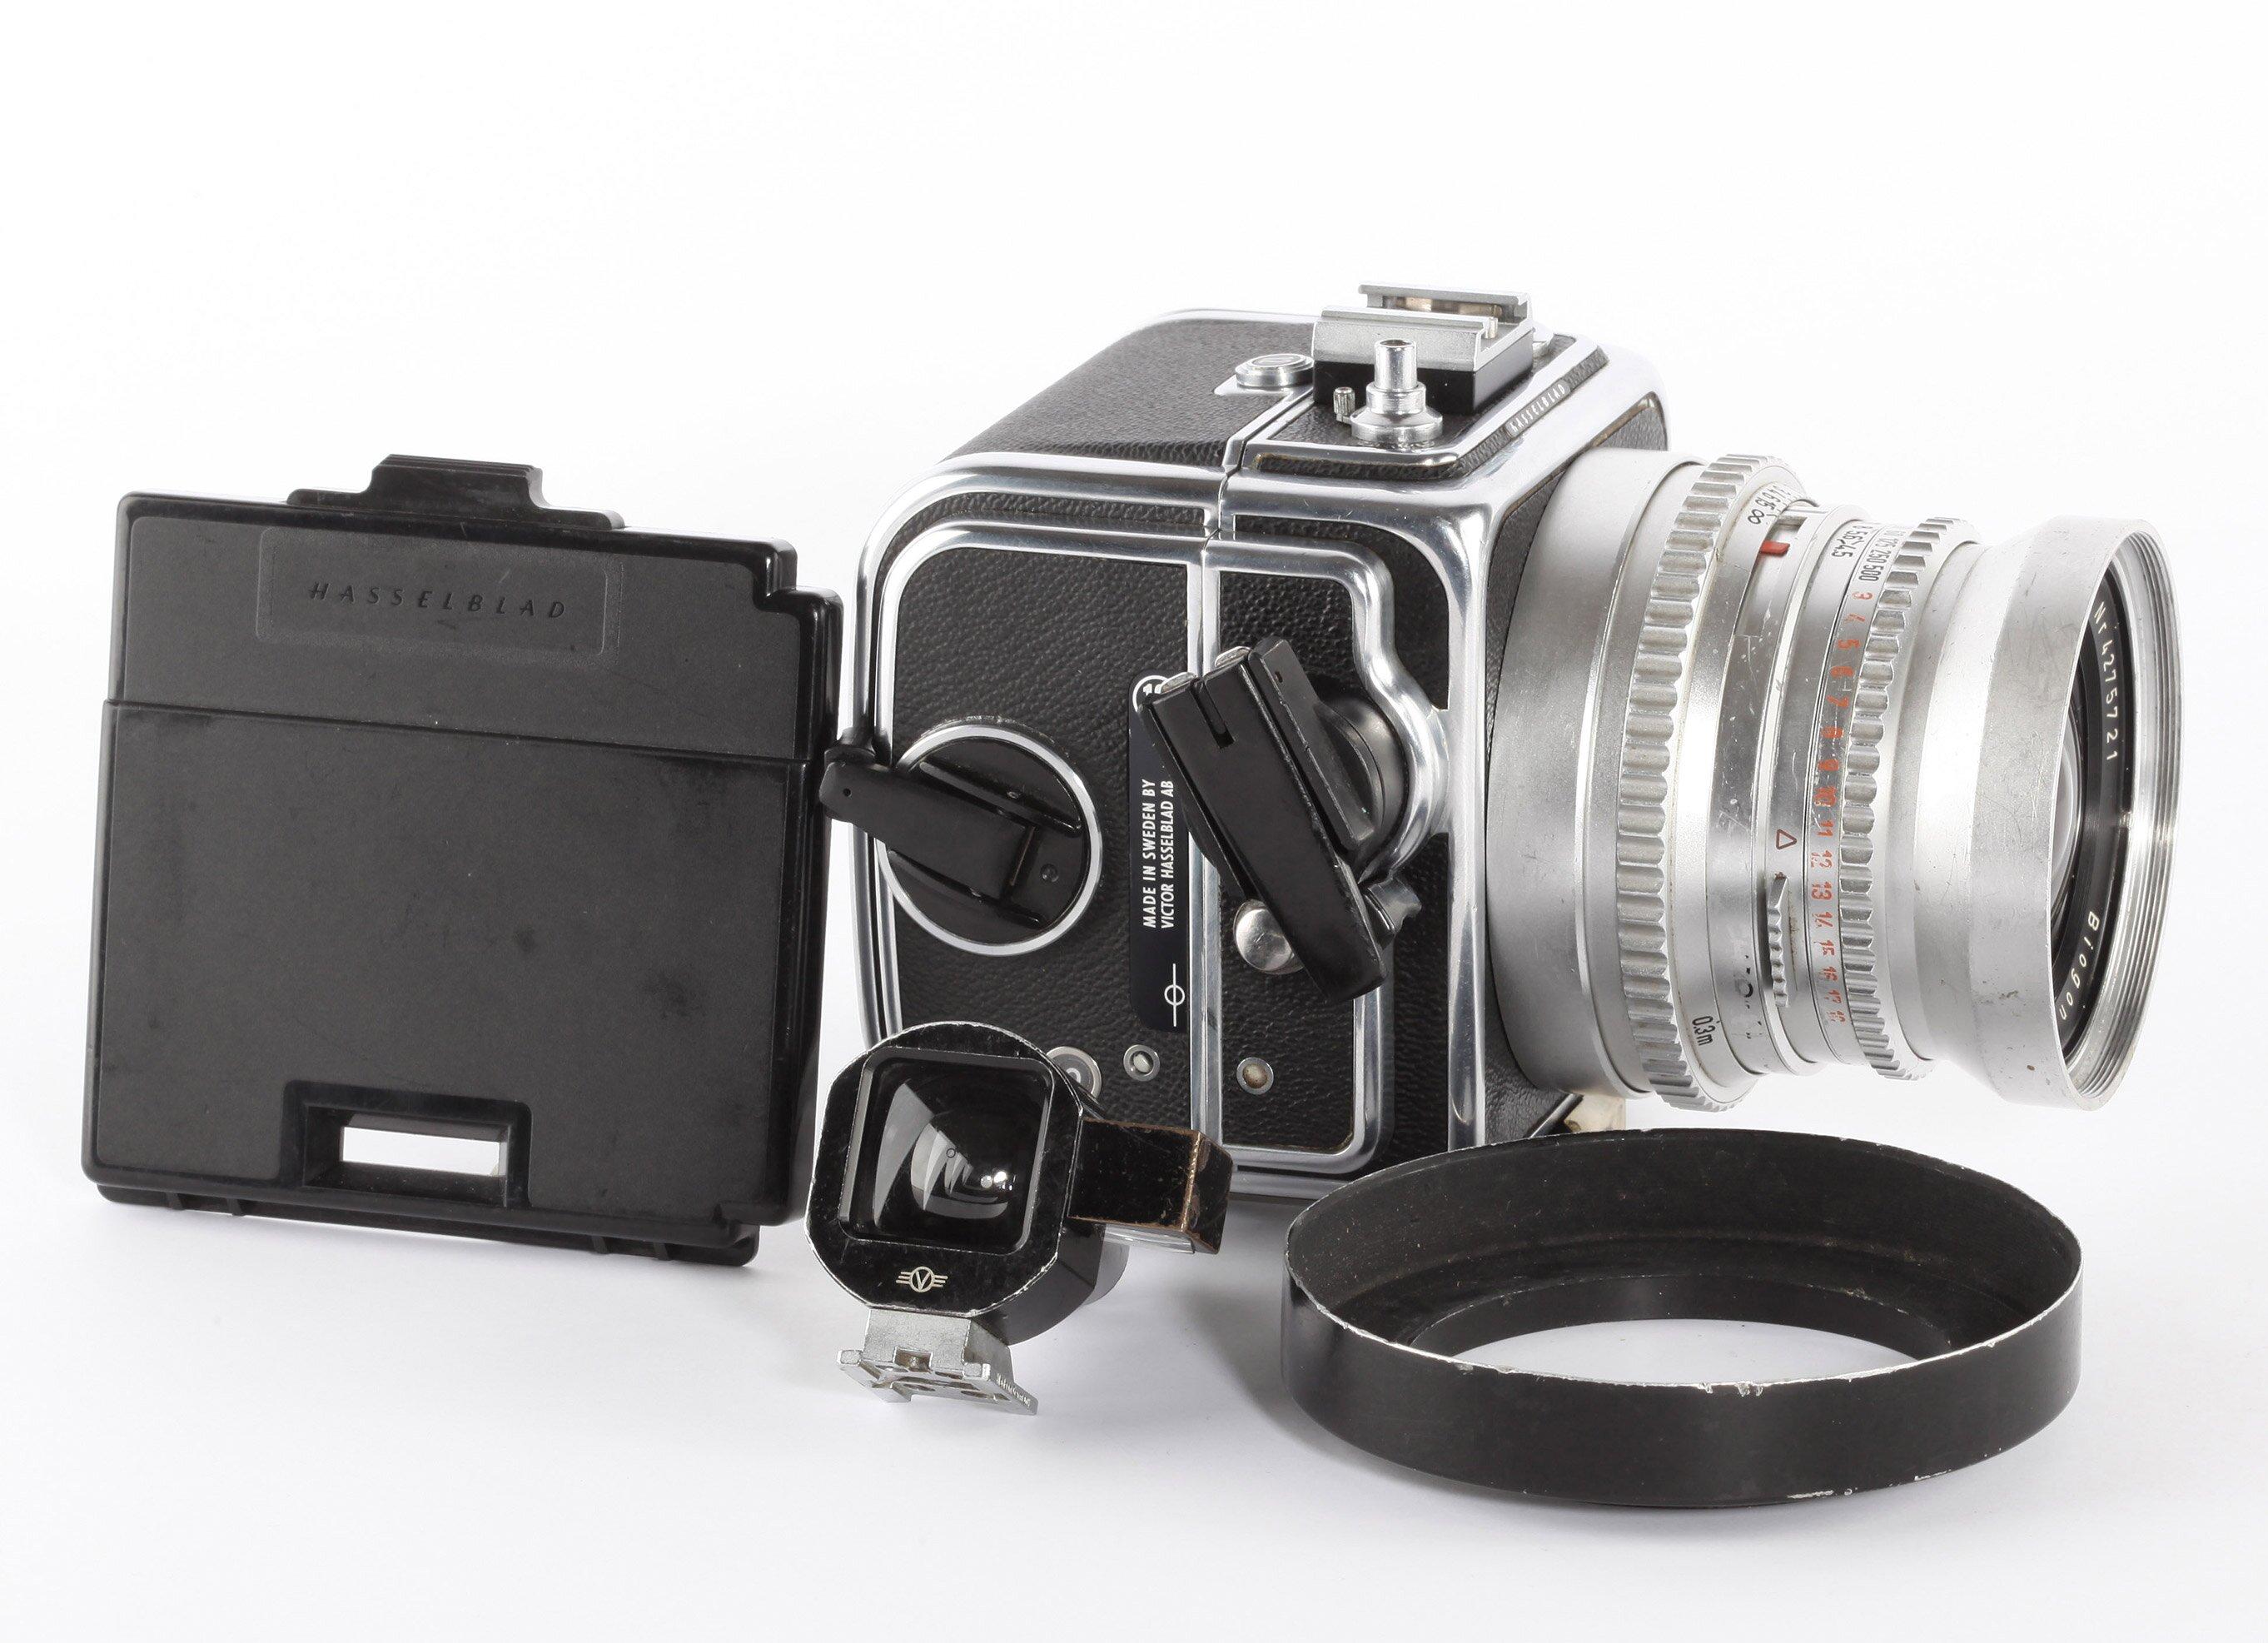 Hasselblad SWC/M Carl Zeiss Biogon 4,5/38mm chrom